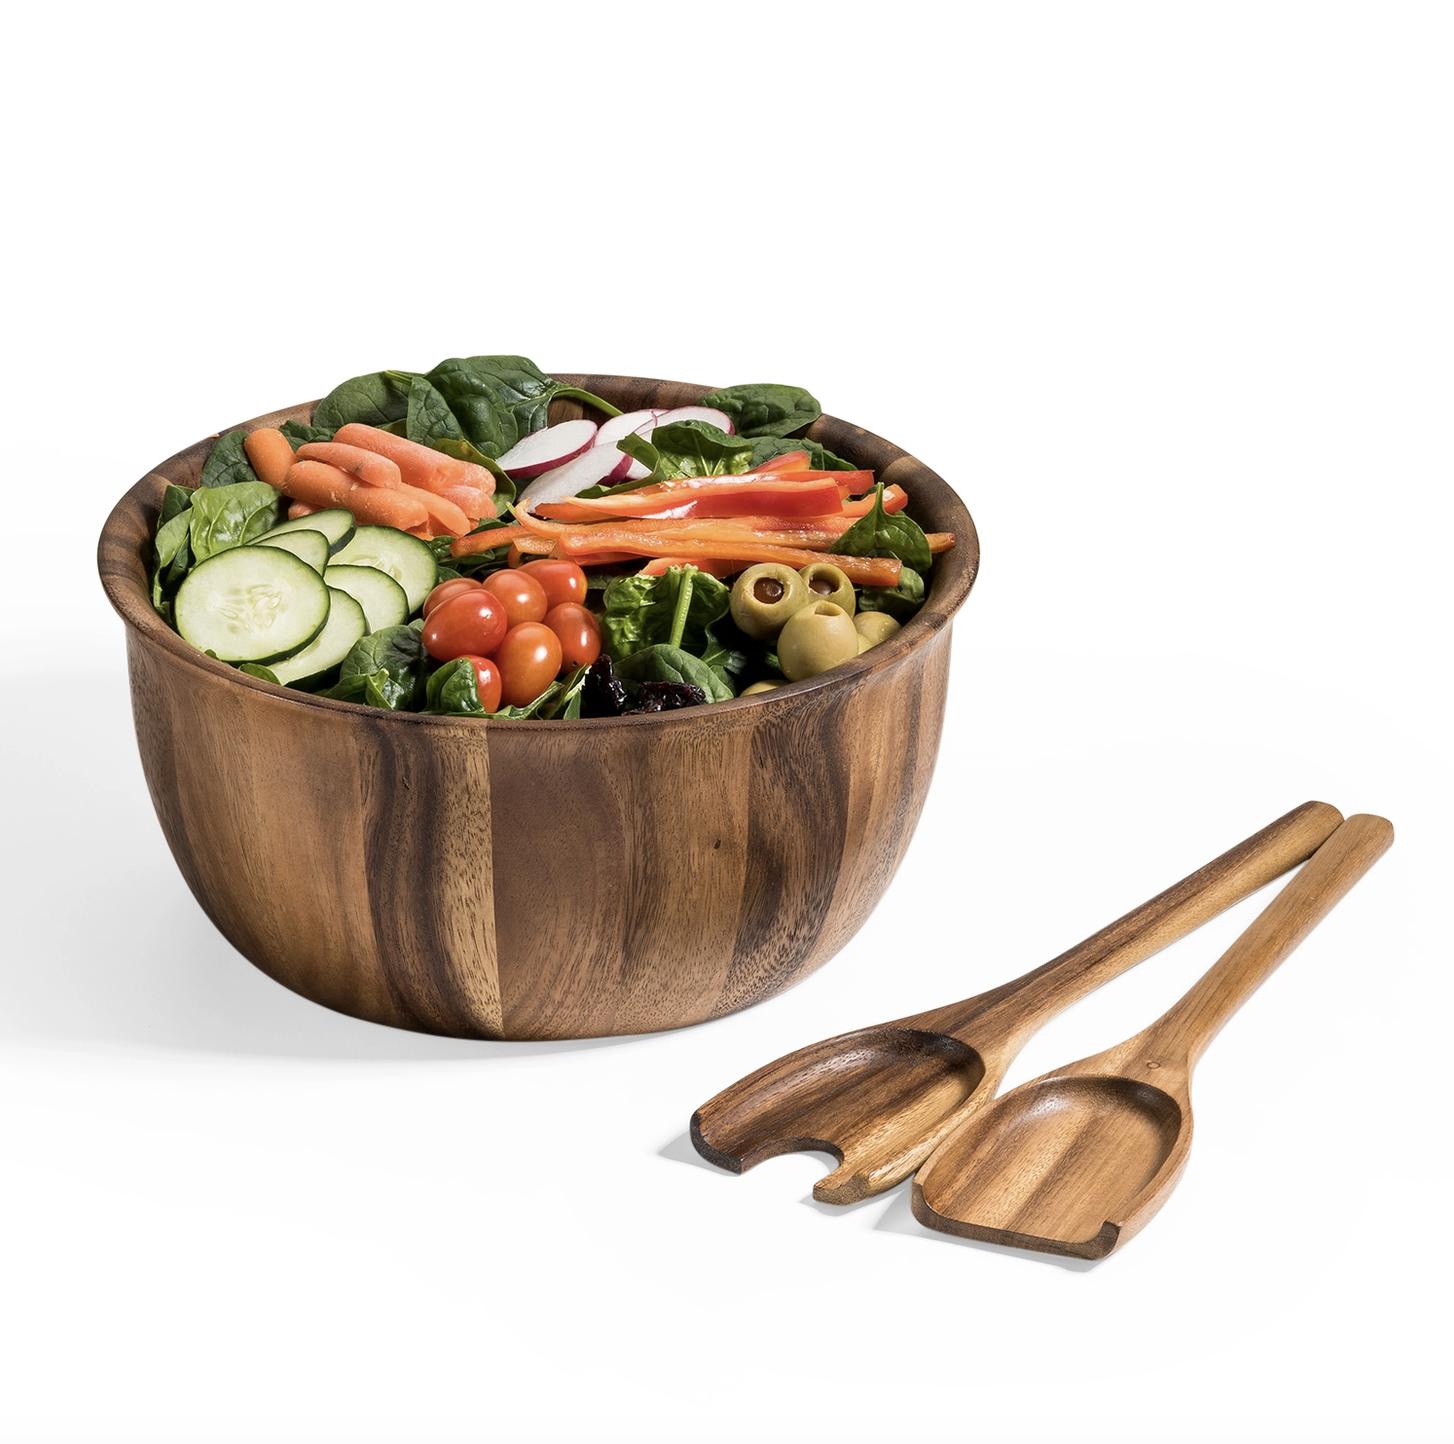 Kalmar Salad Bowl with Servers